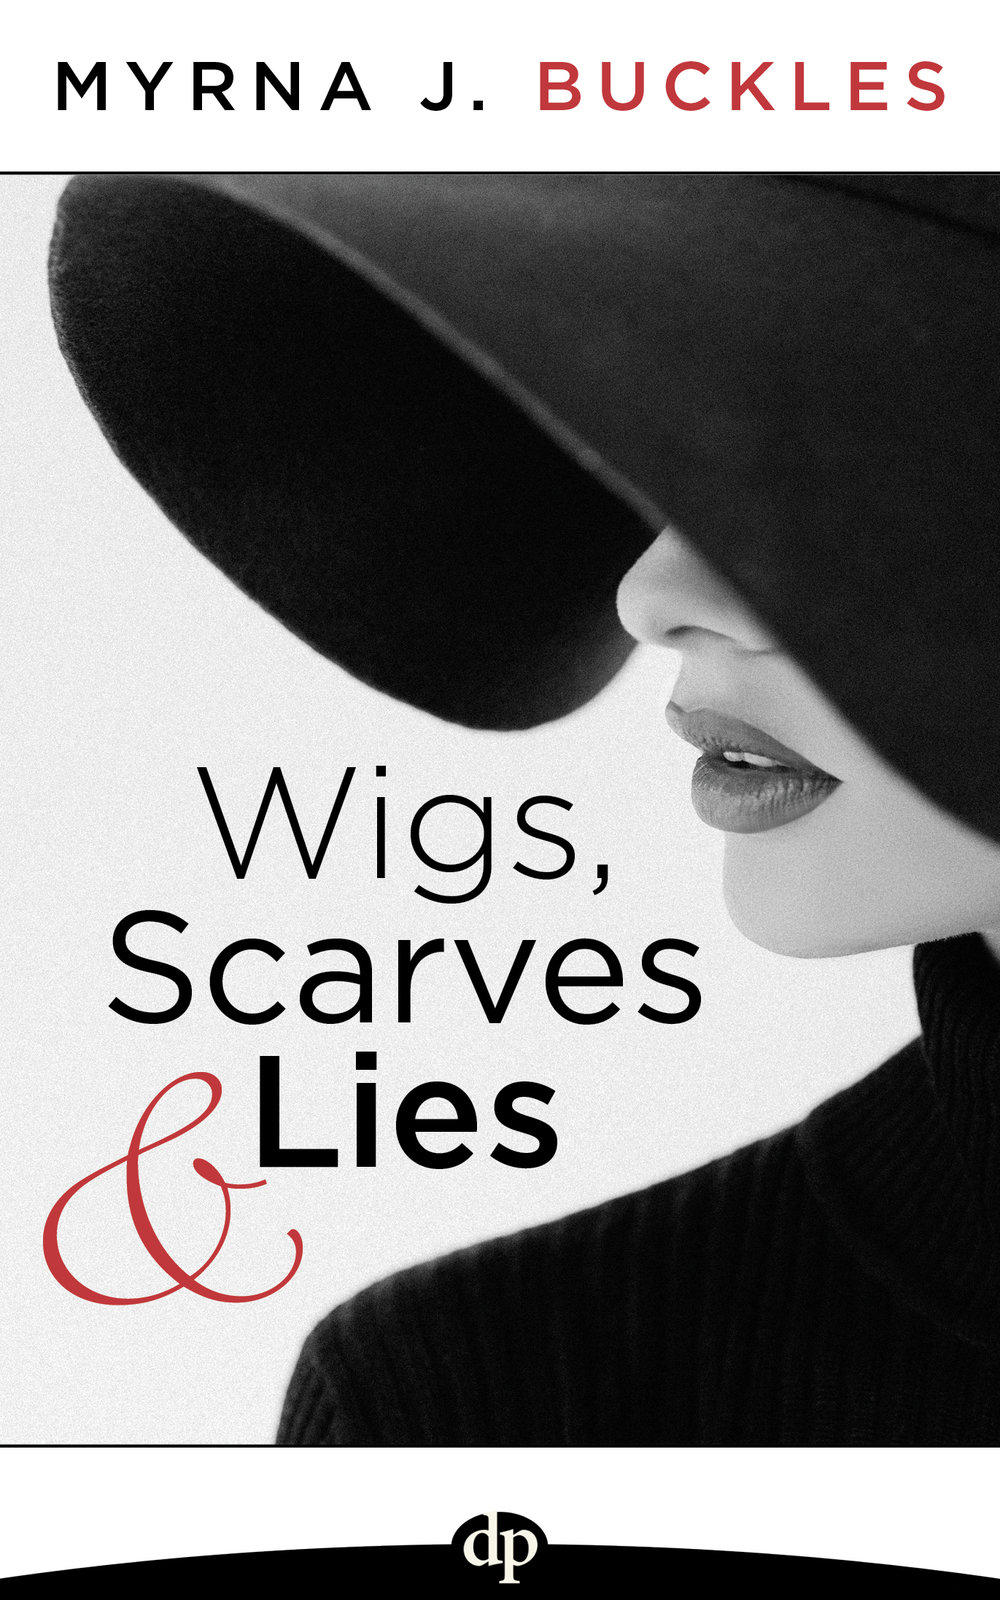 Buckles_Wigs,Scares and Lies_EBK_final.jpg